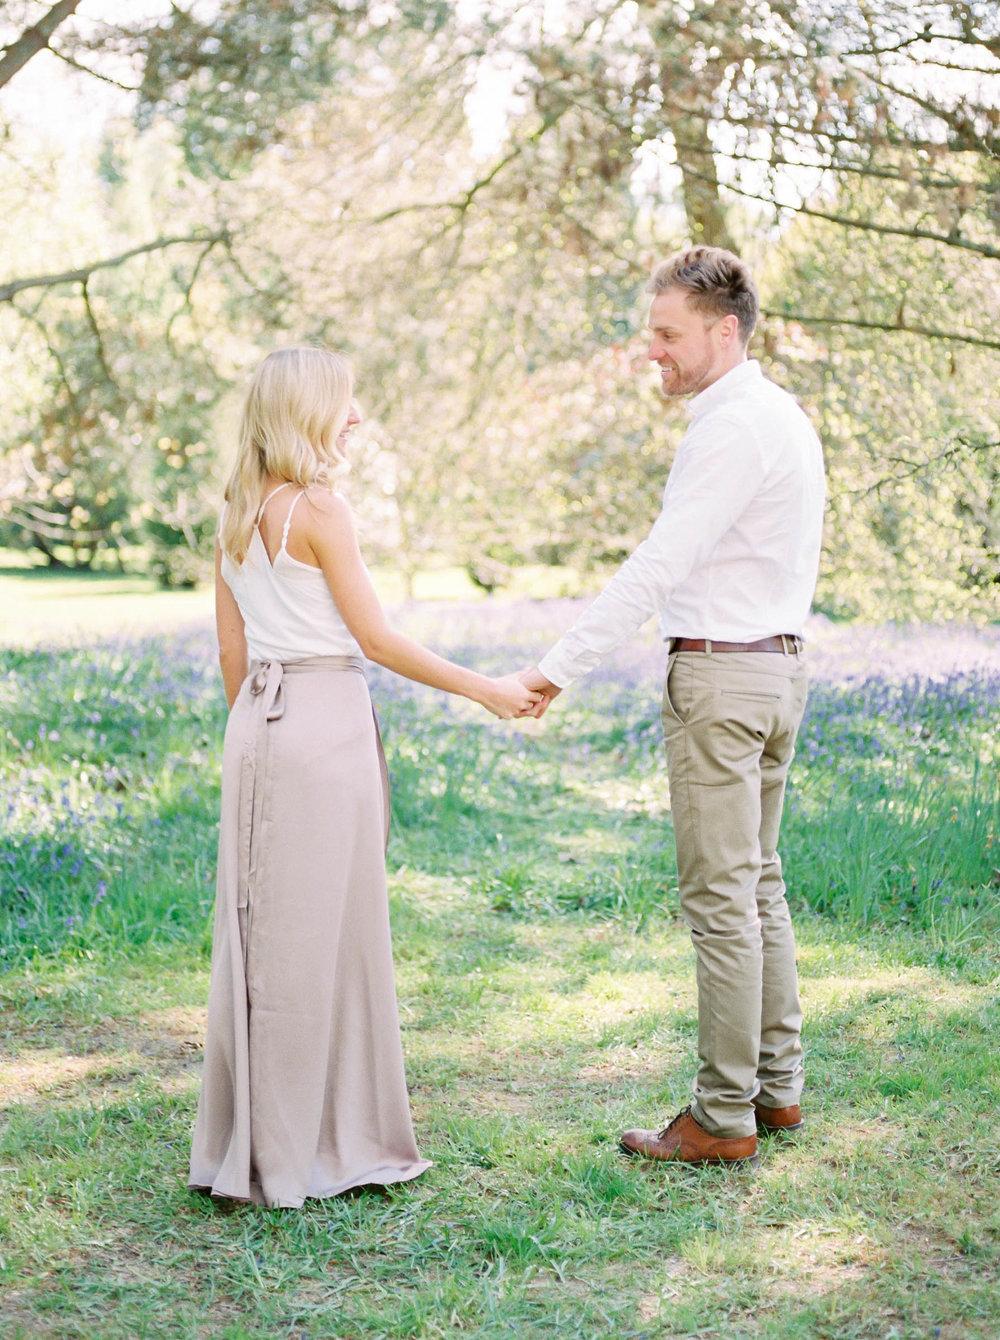 Amy O'Boyle Photography- Destination & UK Fine Art Film Wedding Photographer- Sheffield Park Garden National Trust Spring Engagement Shoot-6.jpg